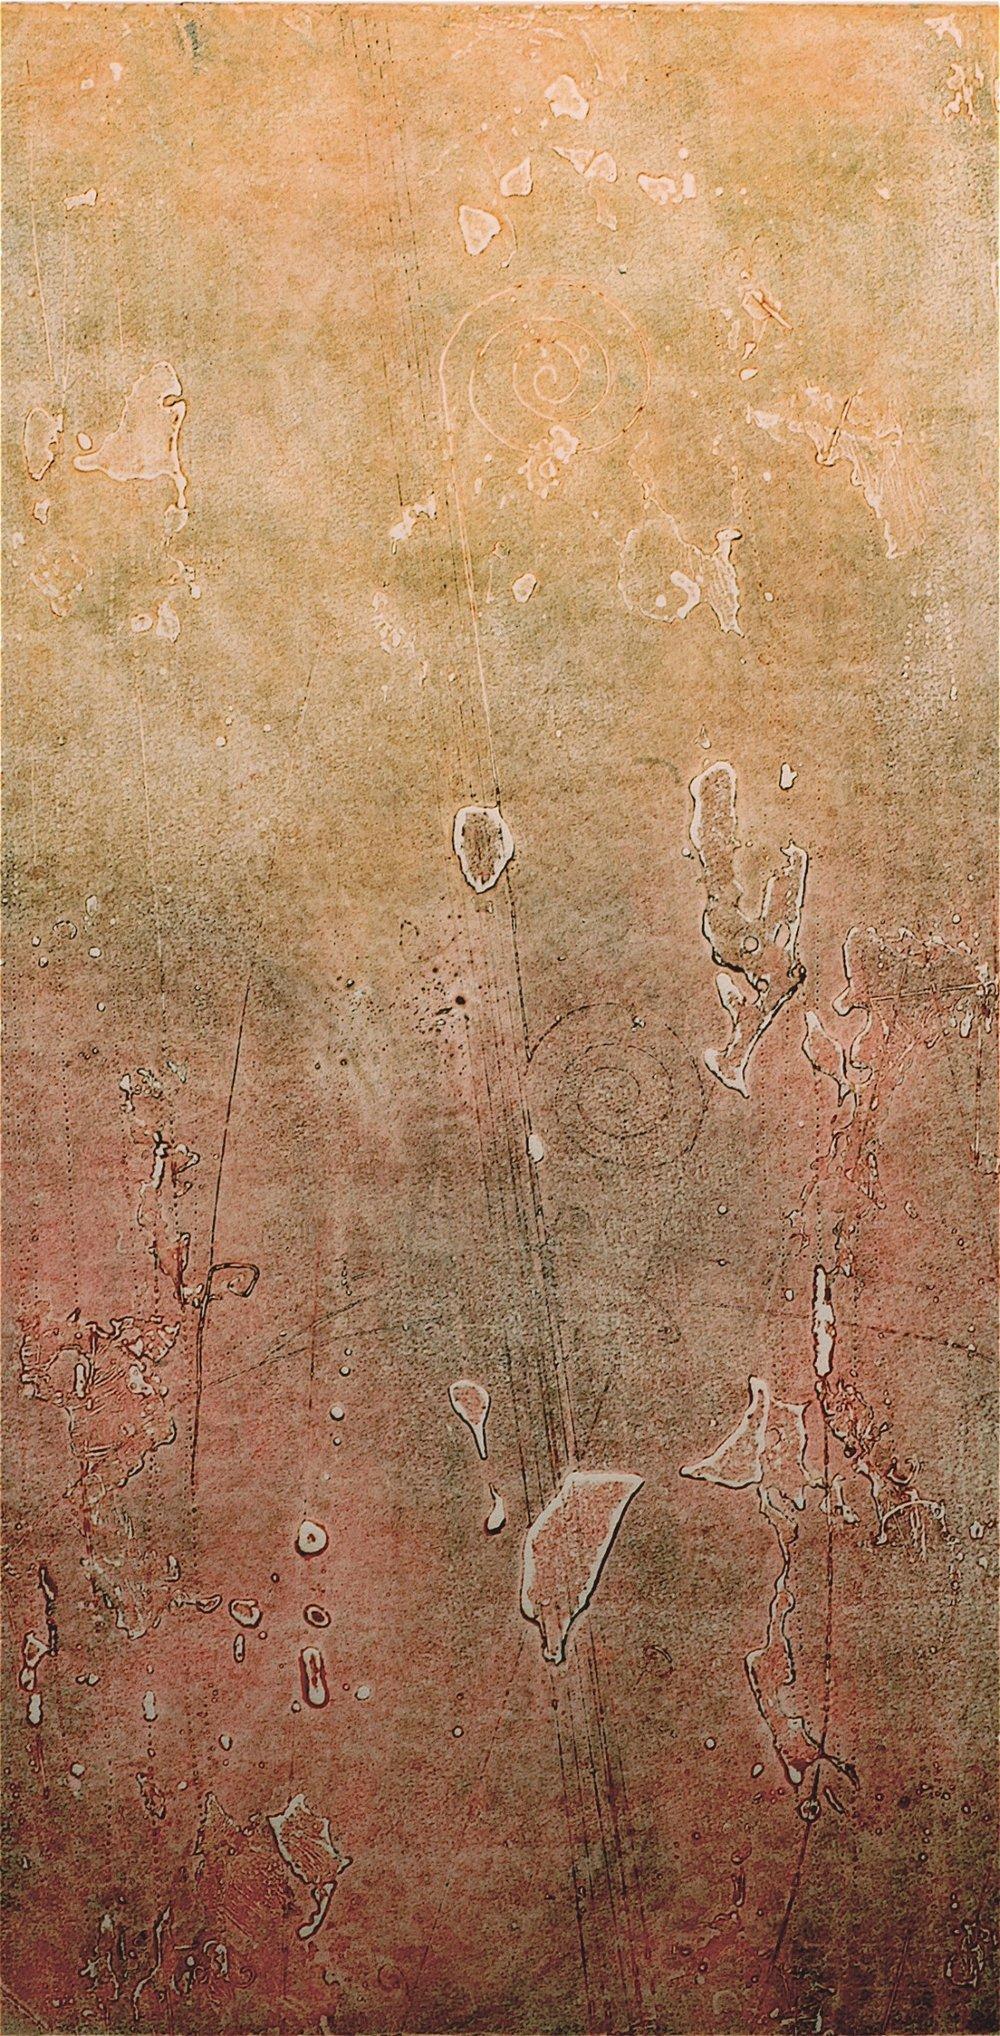 Hadron Print 1 , encaustic collagraph monoprint on paper 24 x 12 inches.   Studio Inventory